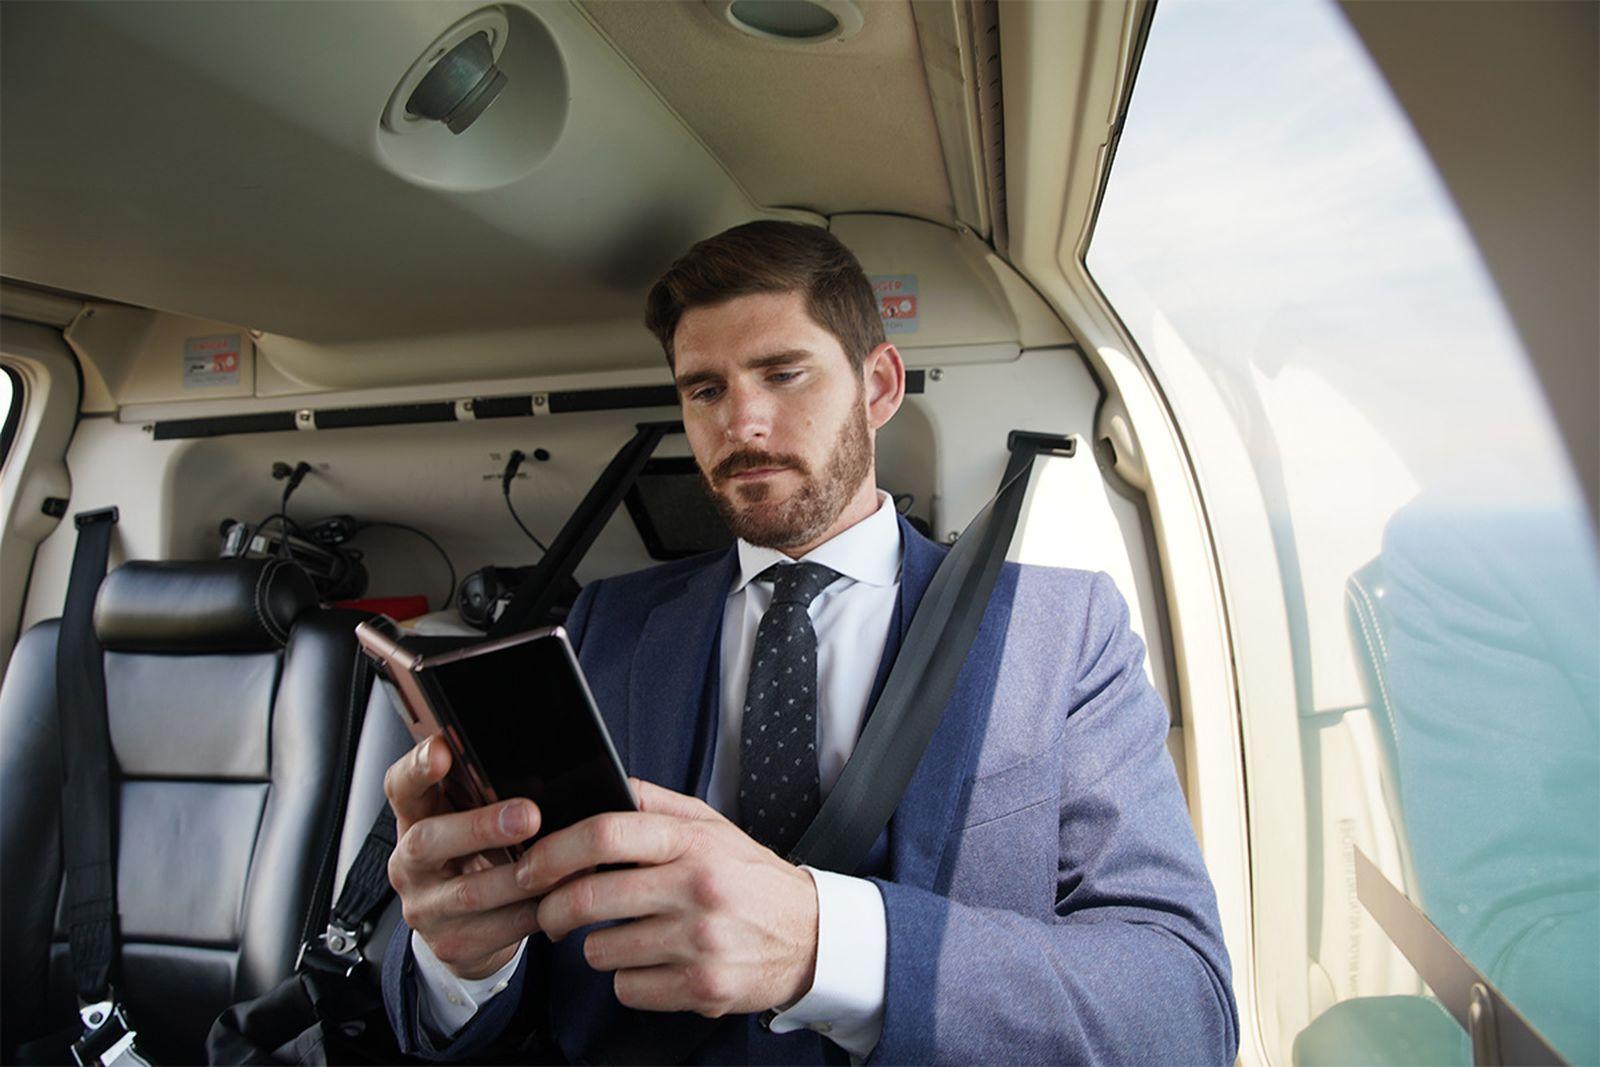 Luxury real estate agent Erik Conover multitasks on Samsung's Galaxy Z Fold2 5G.